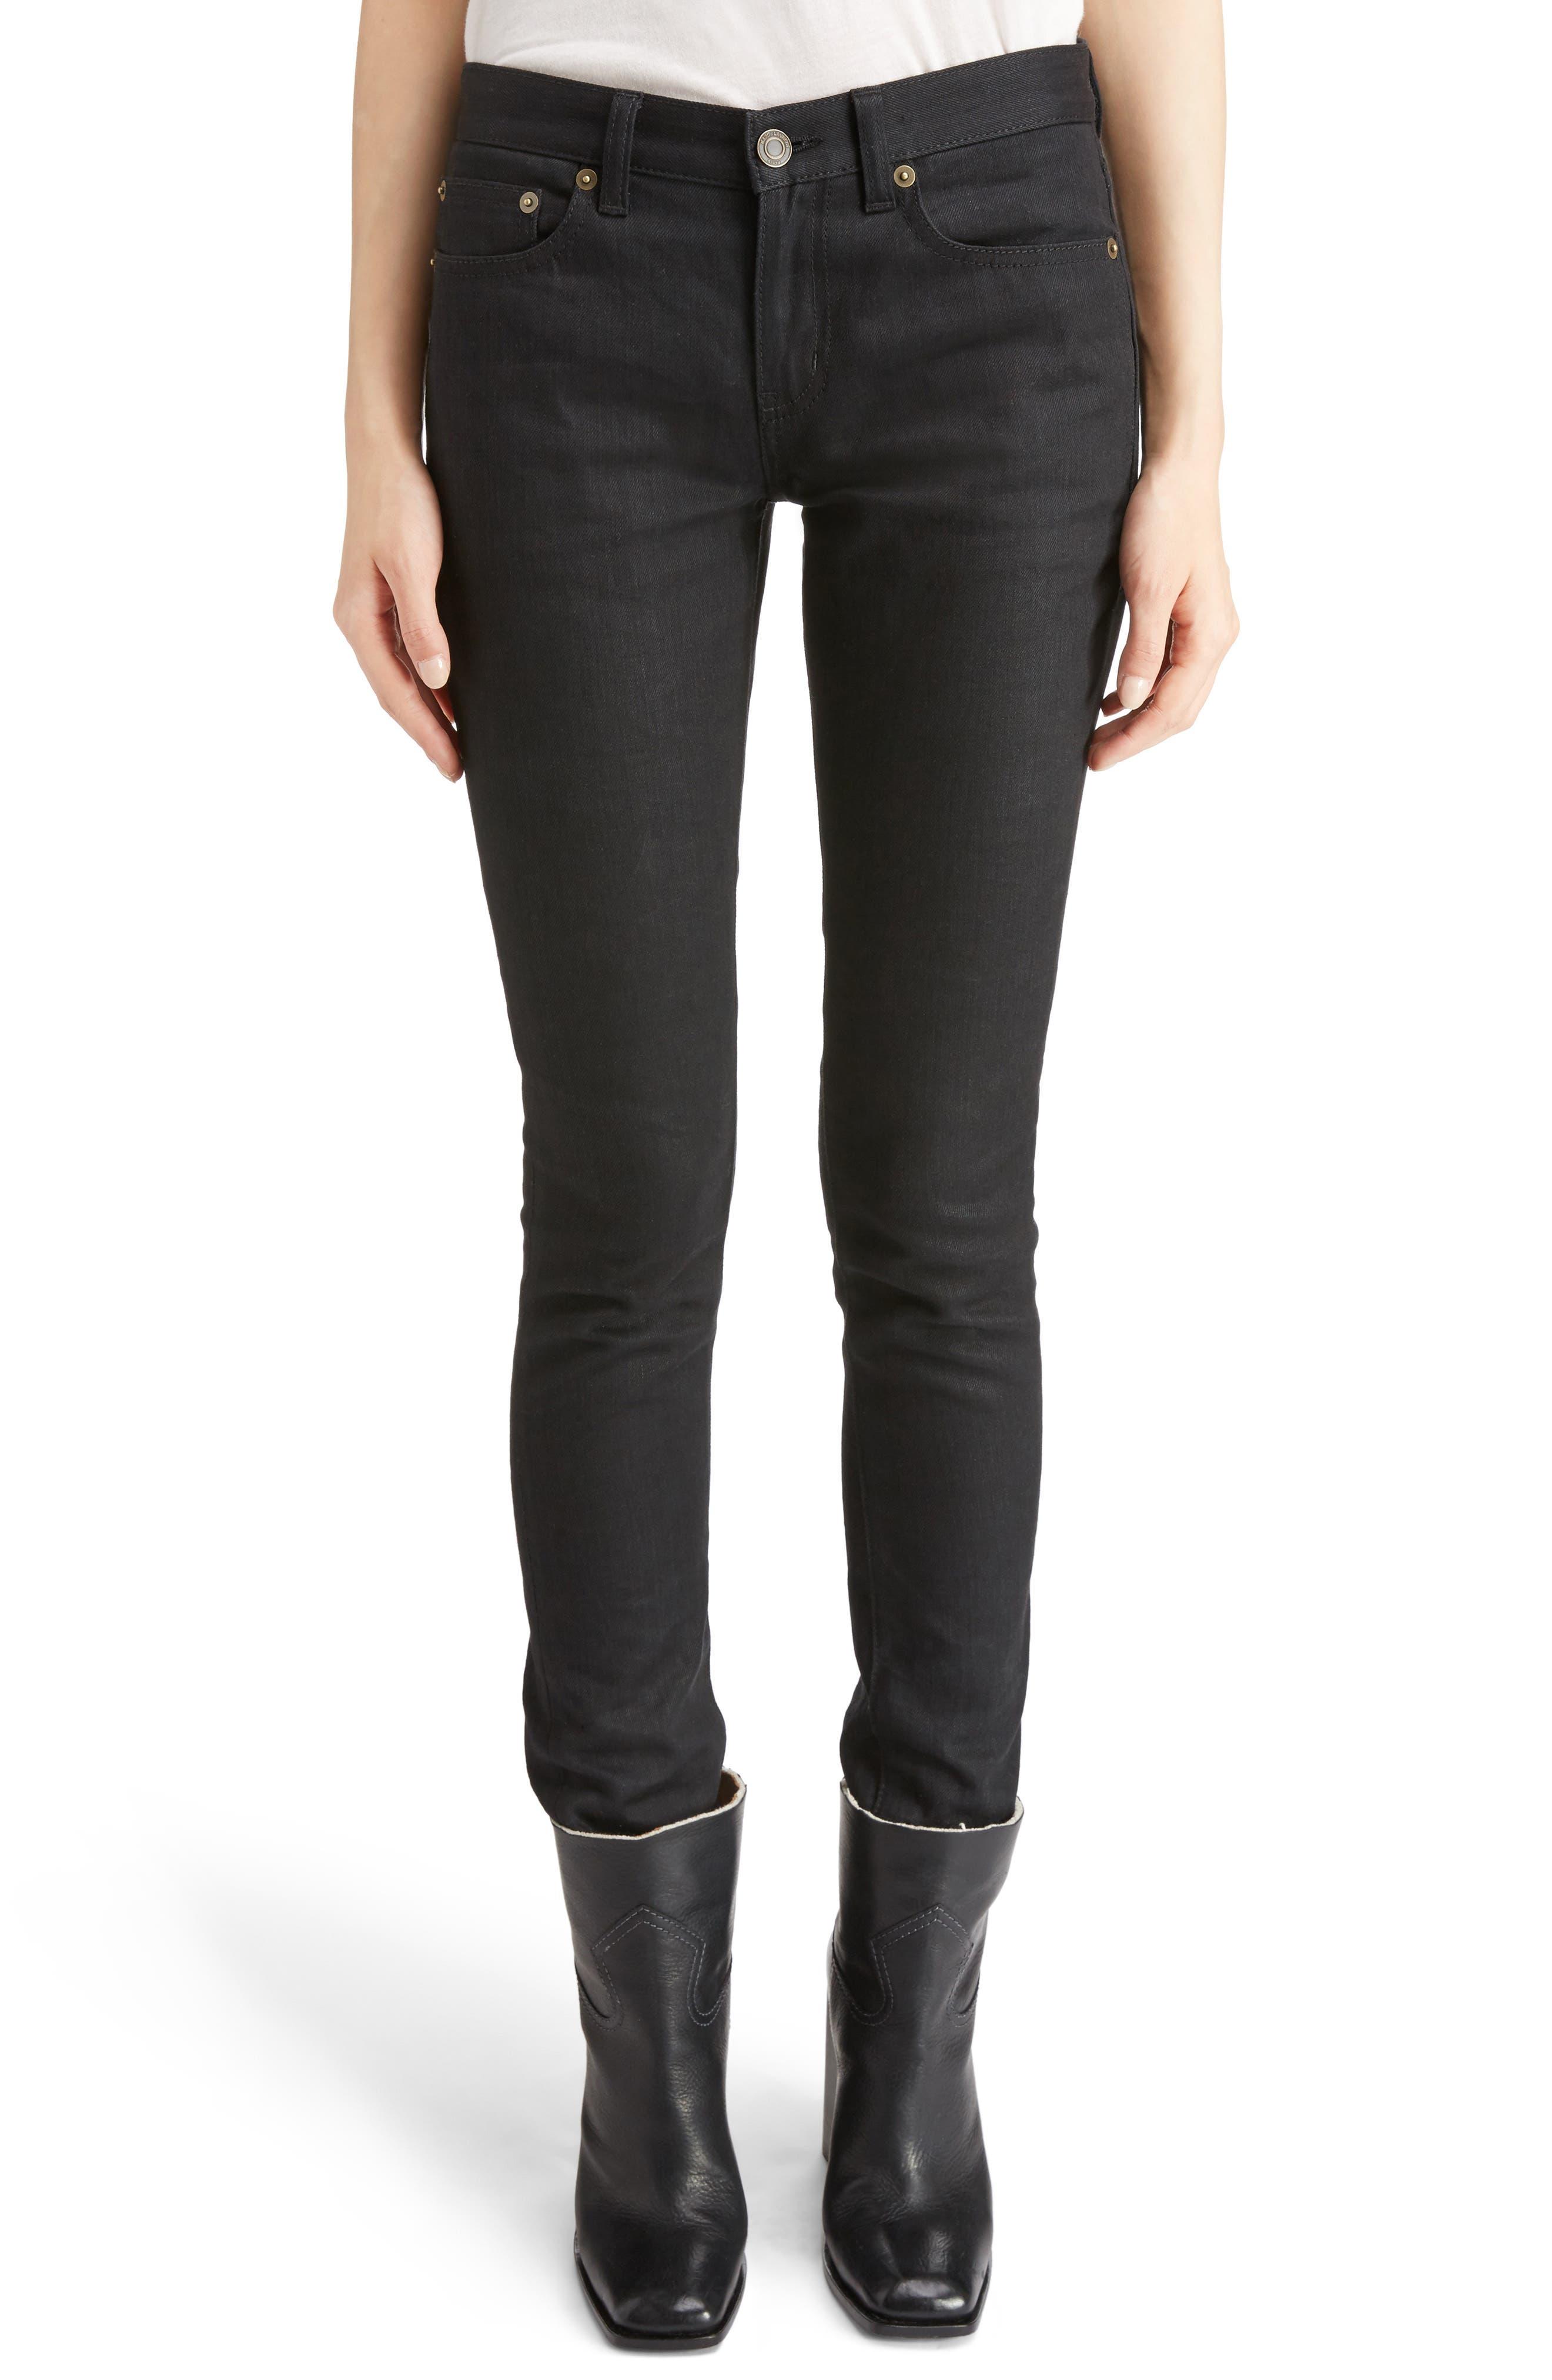 Saint Laurent High Waist Skinny Jeans